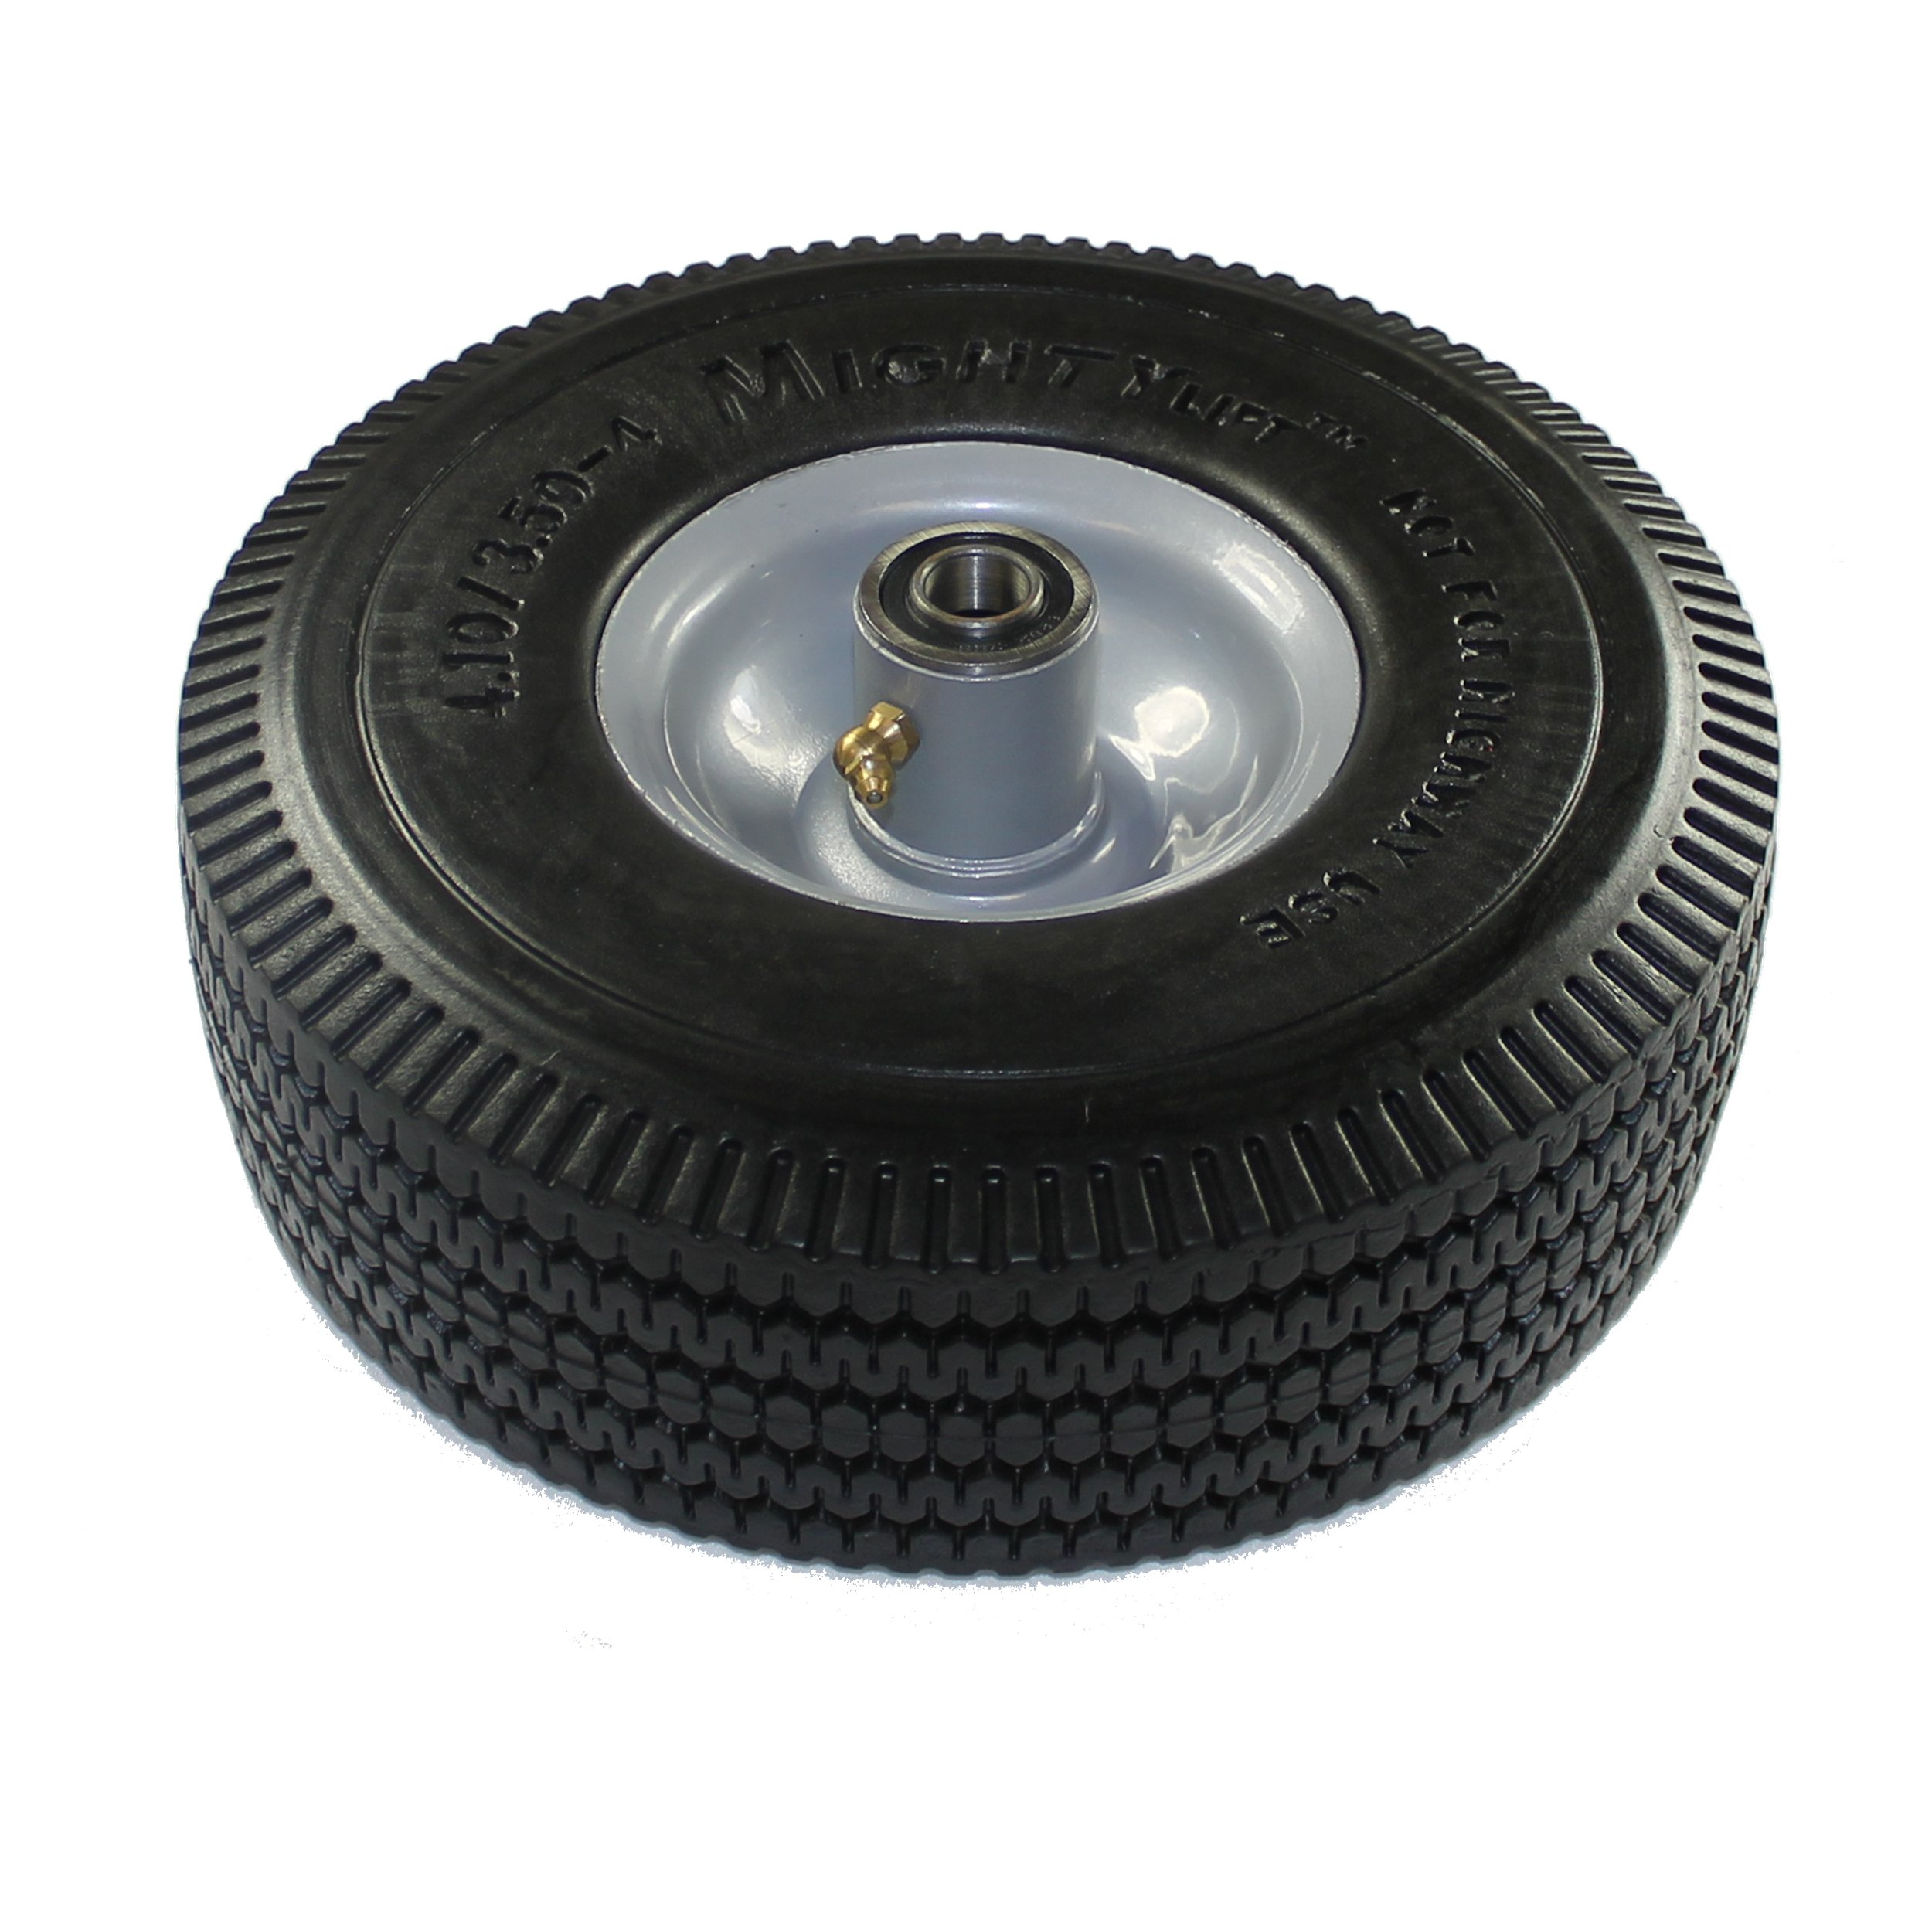 Mighty Lift W-1035-AFO-58P-2 10'' Diameter x 3.5'' Width Polyurethane Wheel, Flat Free Tires, 375 lb Capacity